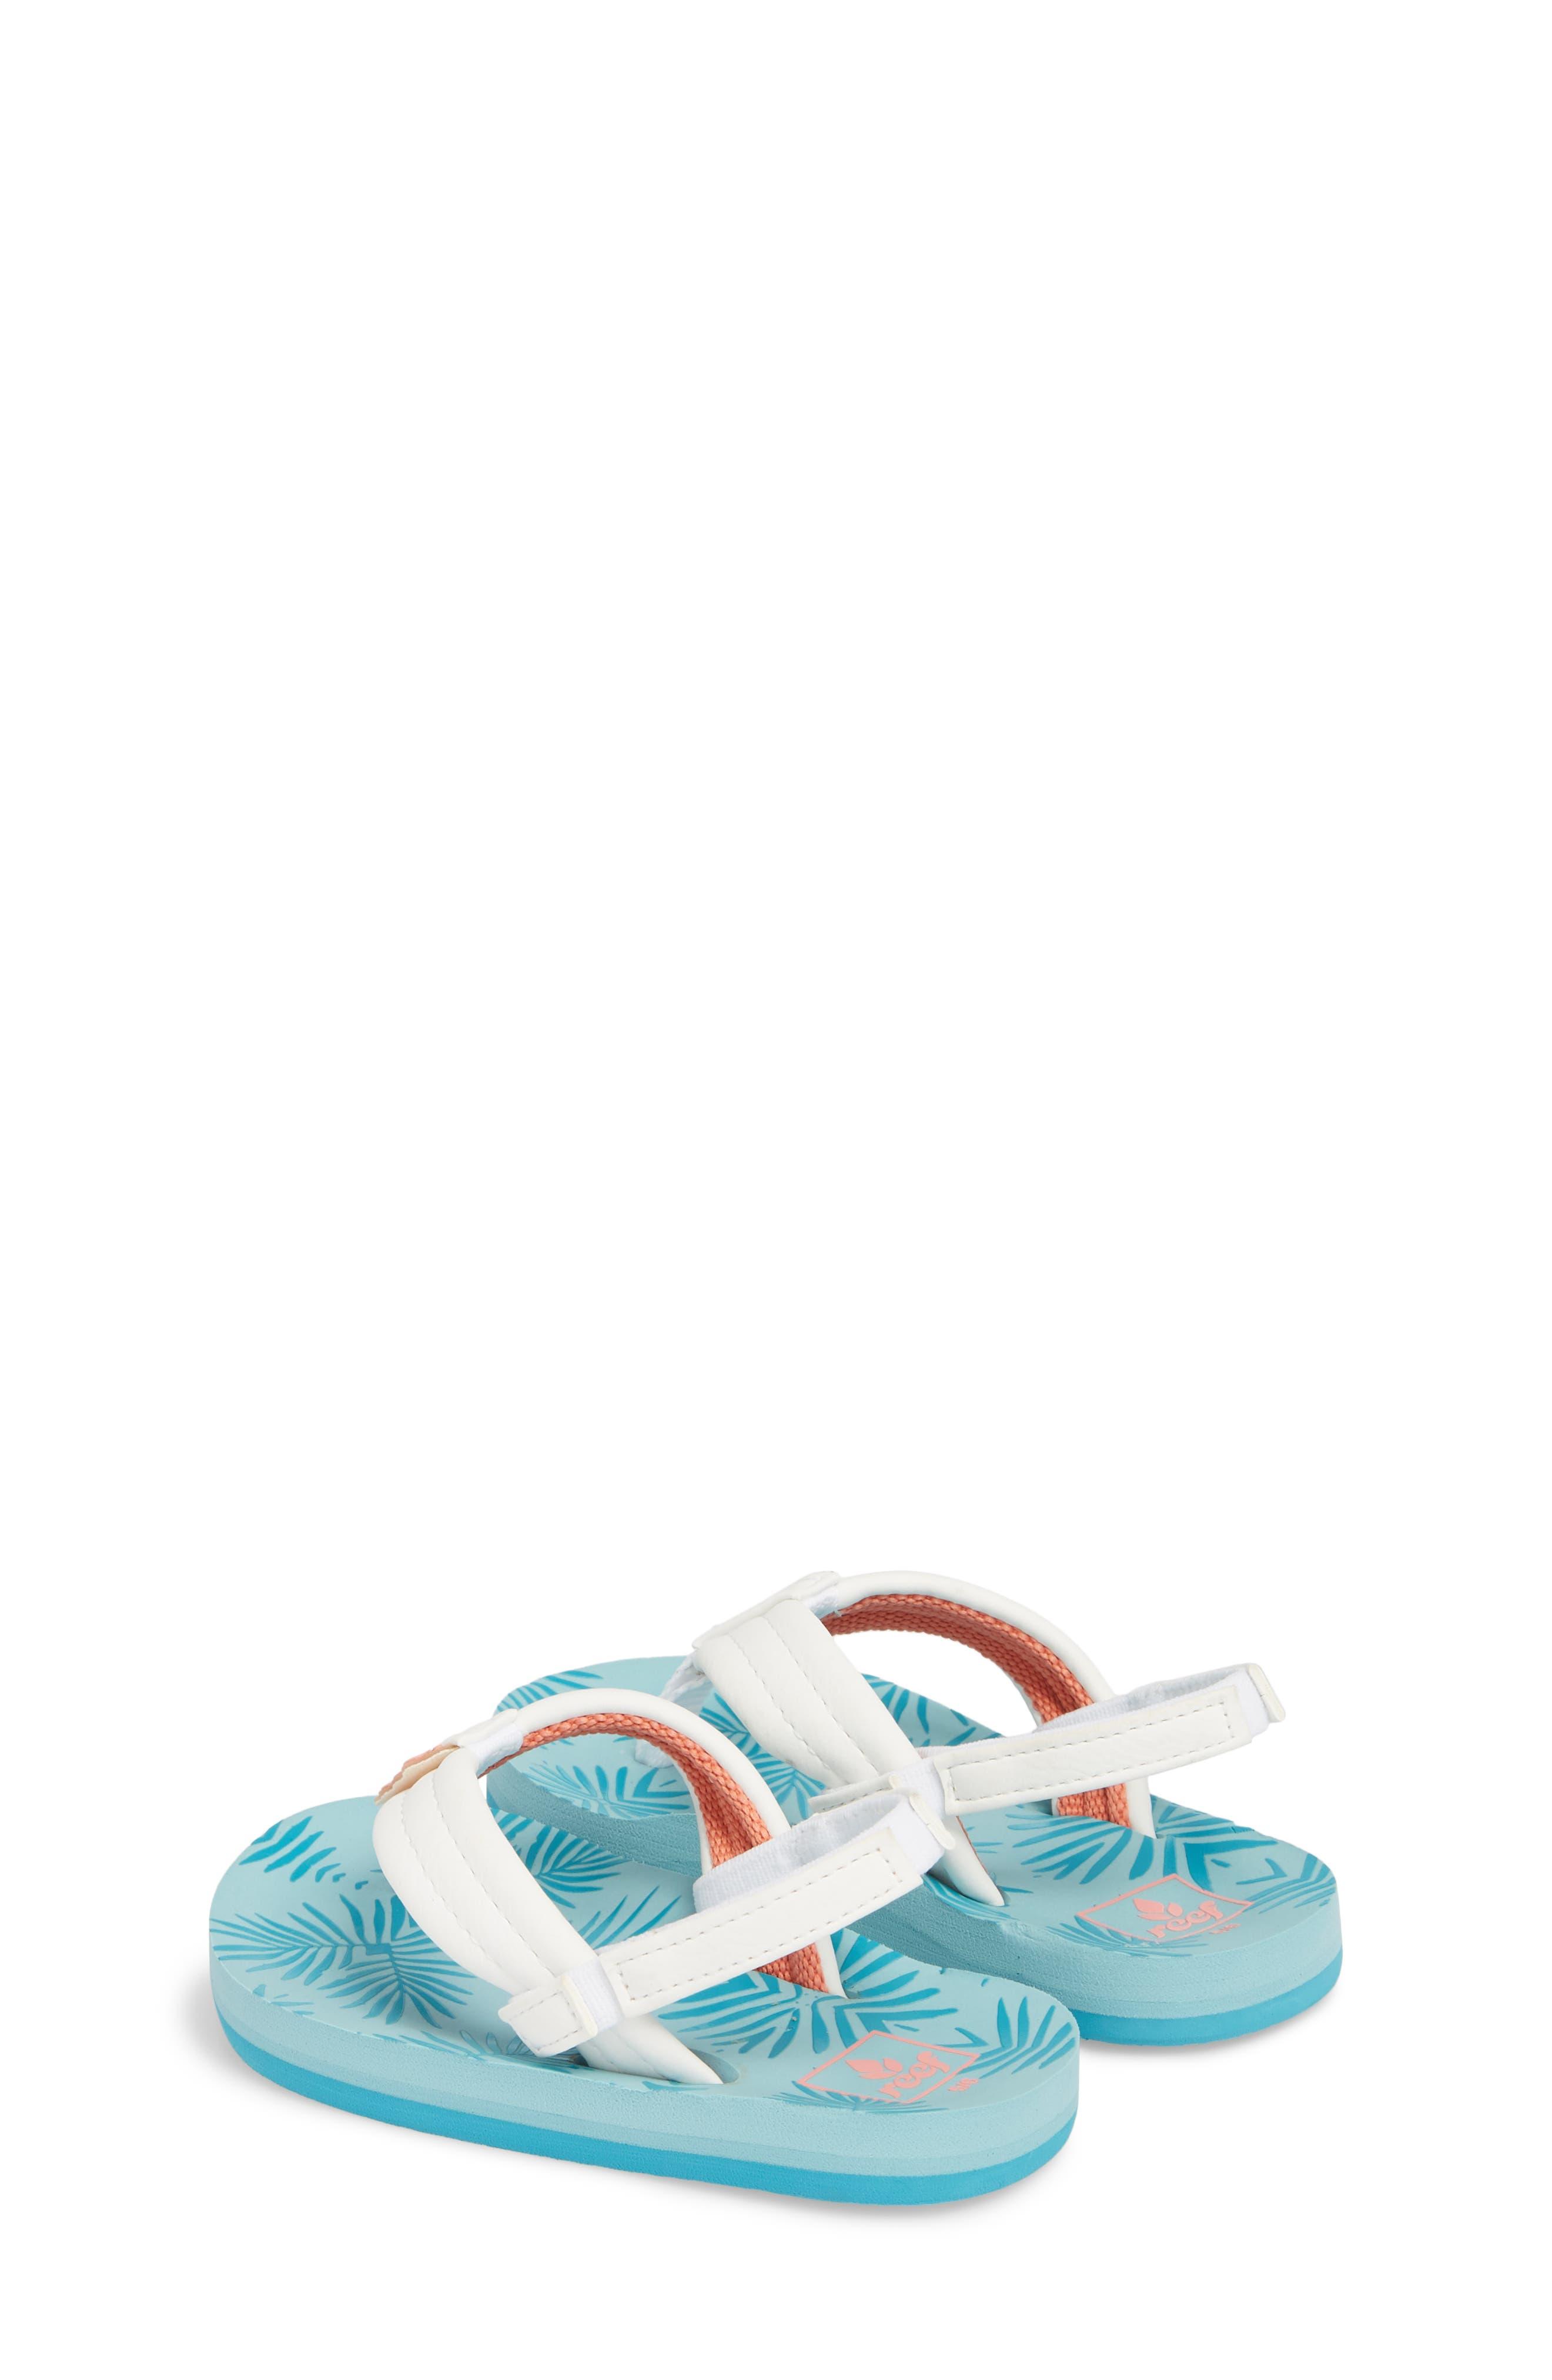 Little Reef Footprints Sandal,                             Alternate thumbnail 2, color,                             Blue